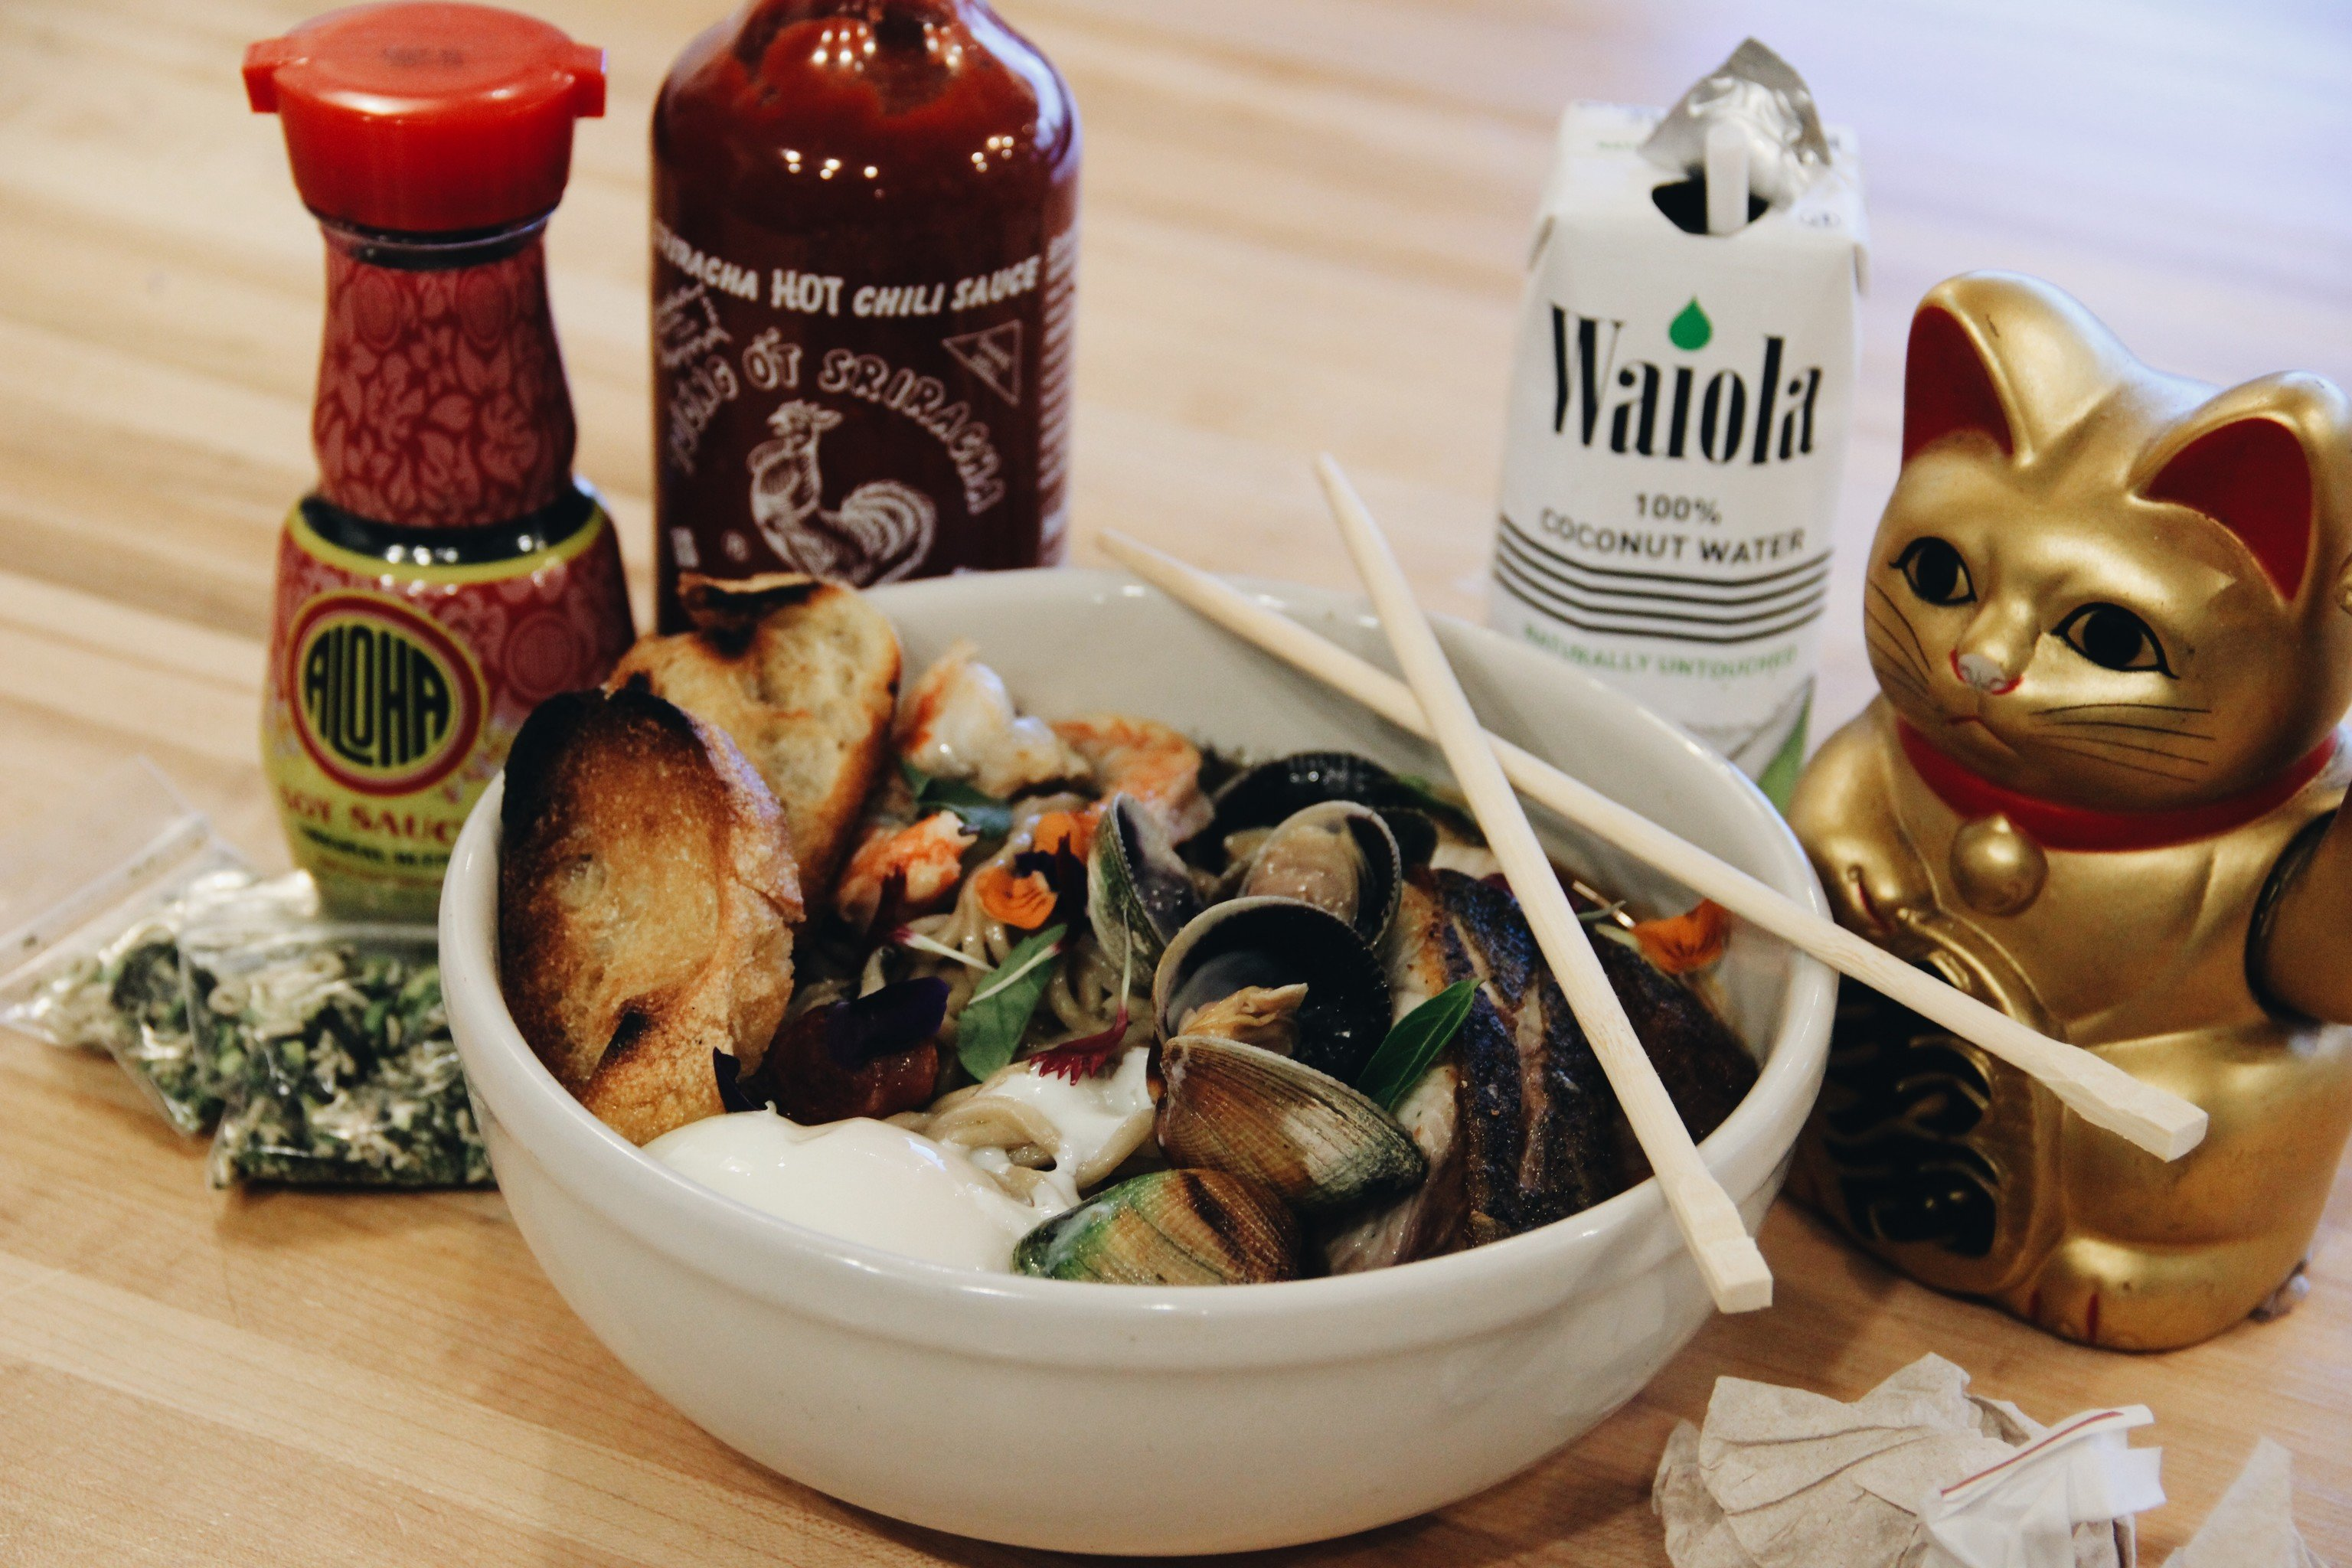 Food + Drink Trip Ideas food dish meal cuisine brunch vegetarian food breakfast appetizer recipe